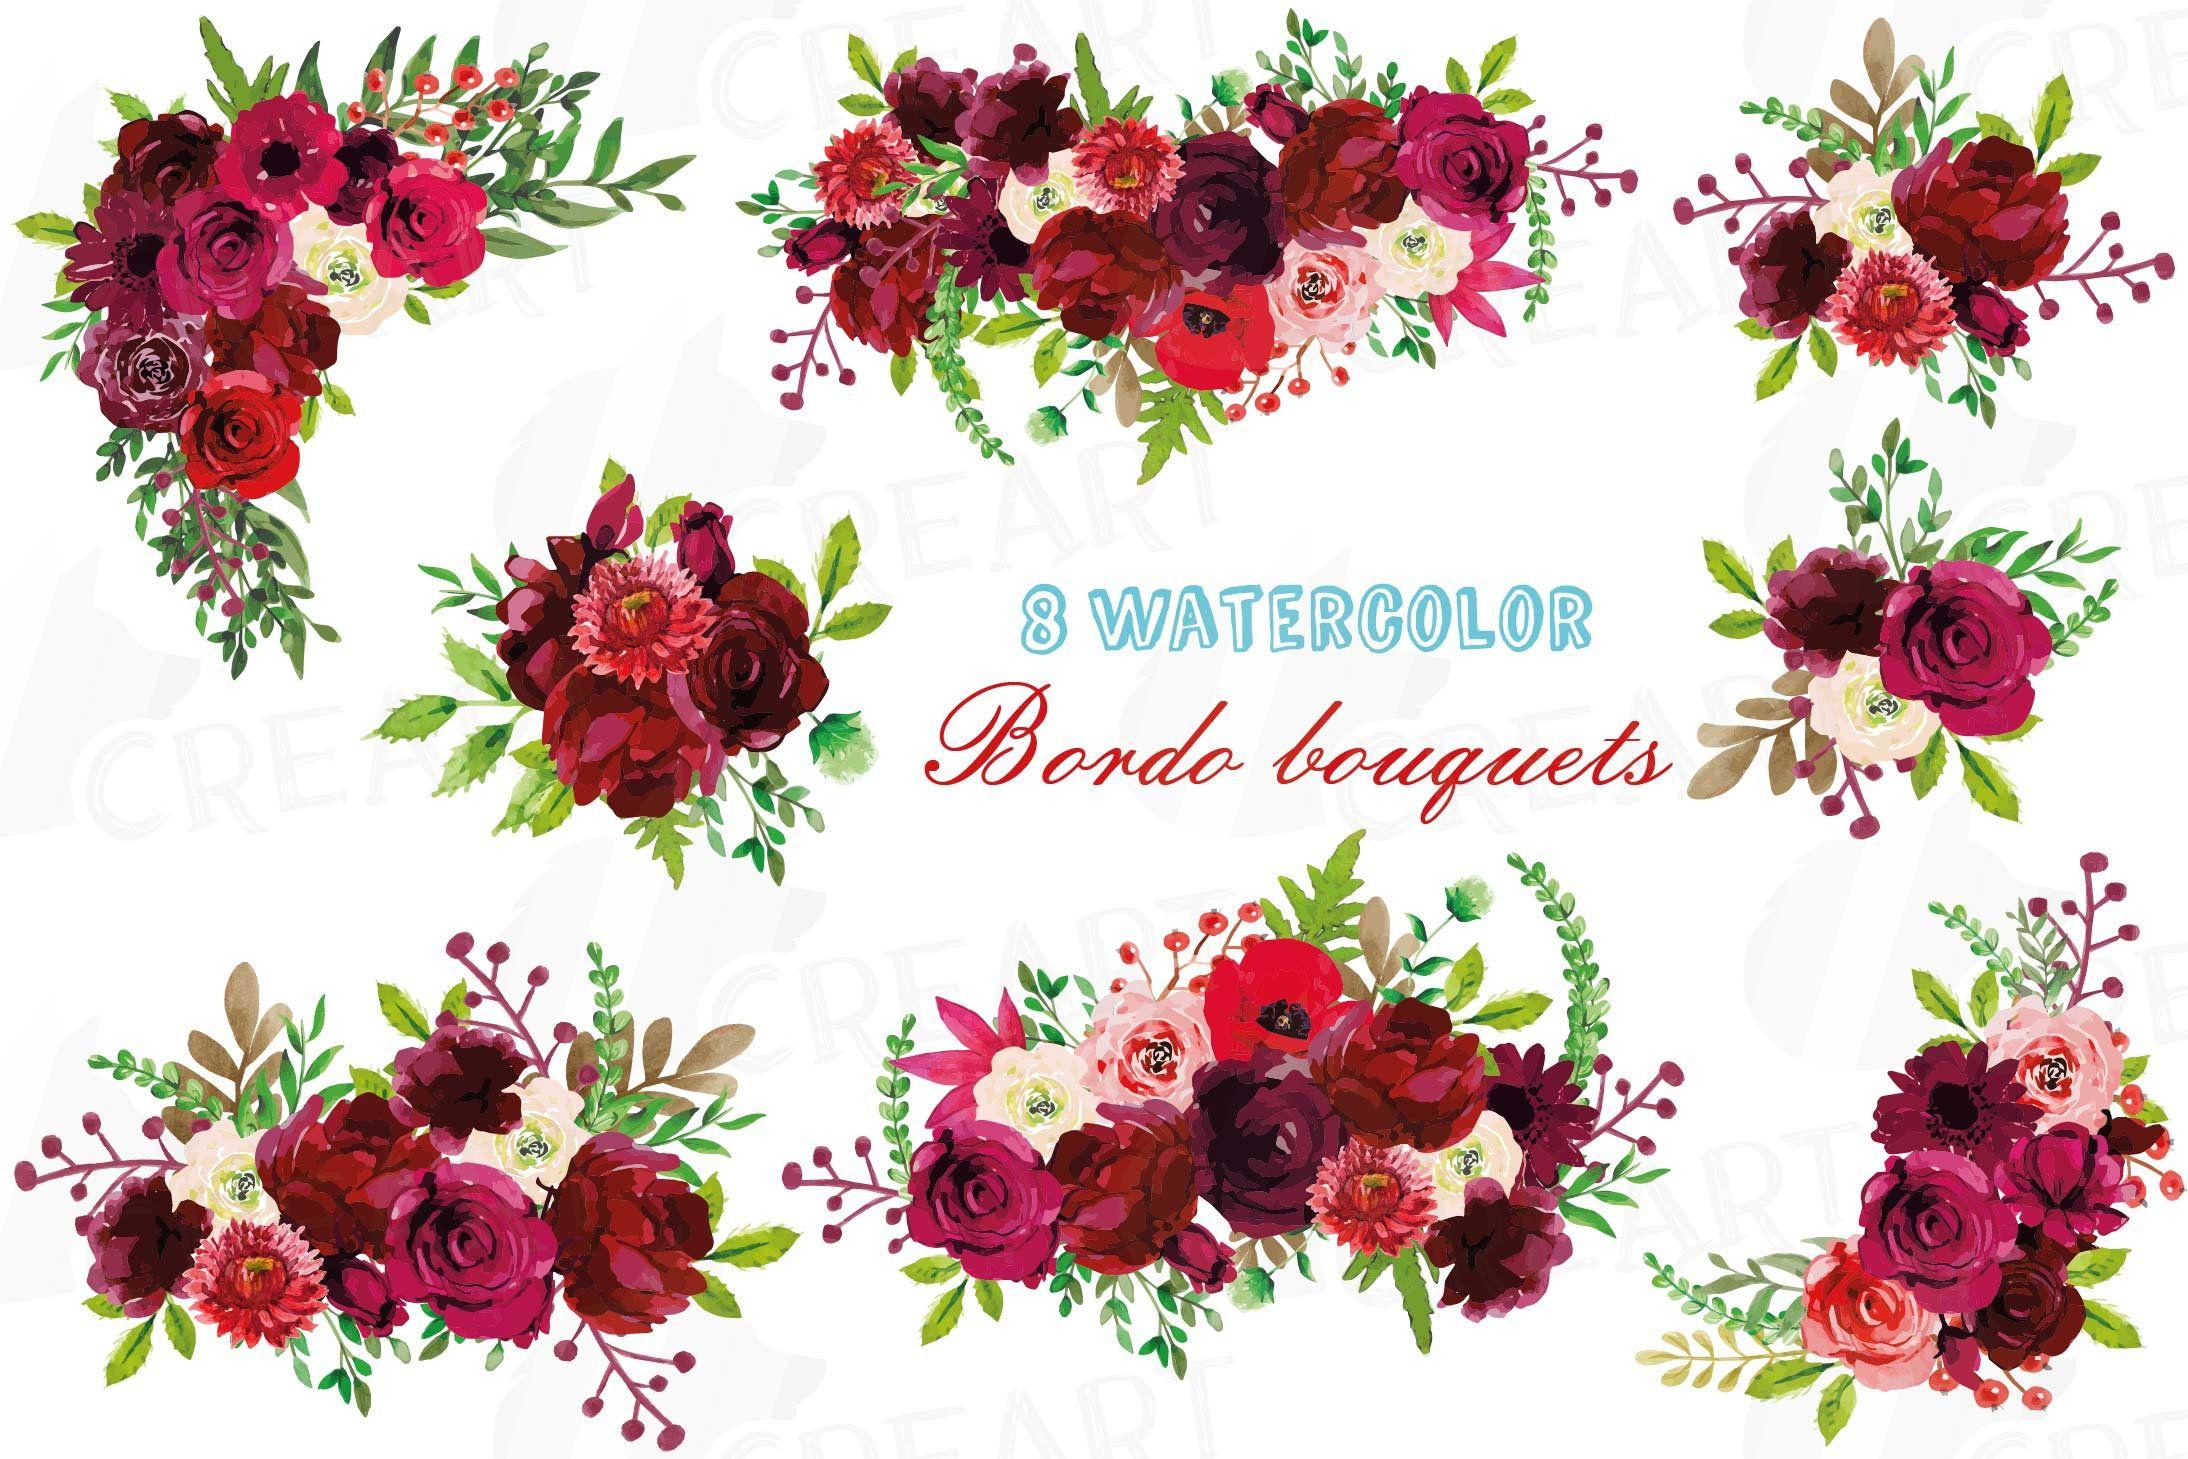 Boho Burgundy Red Watercolor Clip Art Floral Bouquets Bordo Etsy In 2021 Watercolor Clipart Floral Art Clip Art